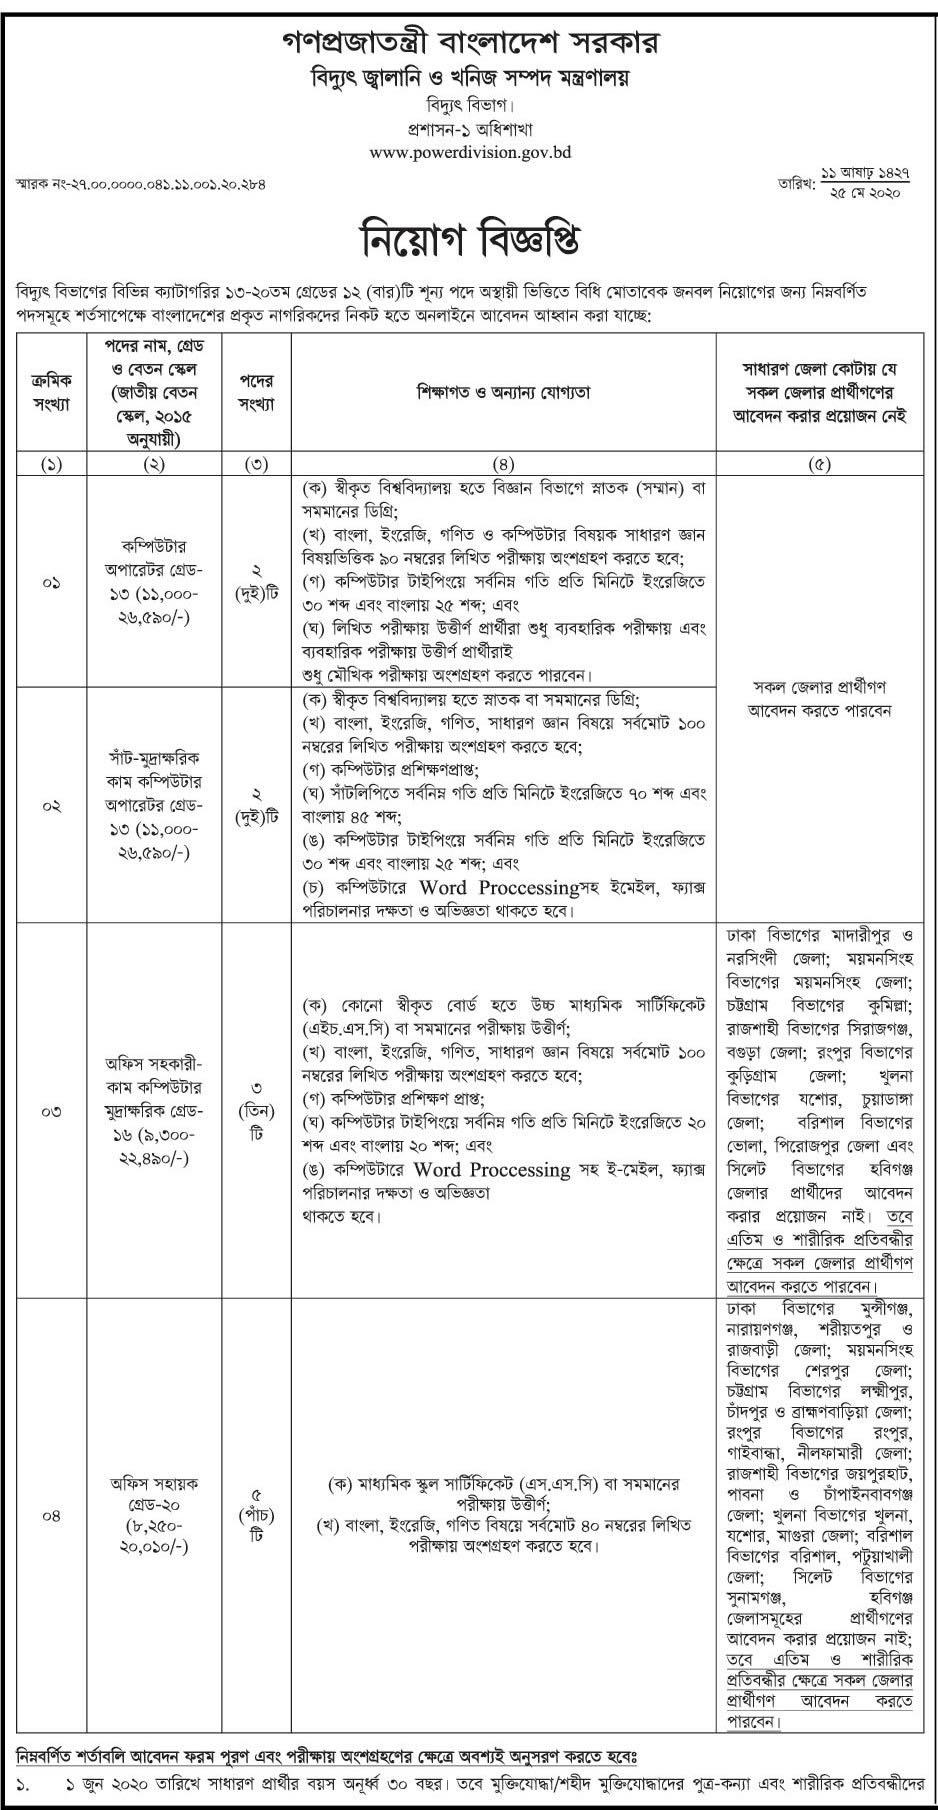 EMRD Job Circular Apply - emrd.gov.bd